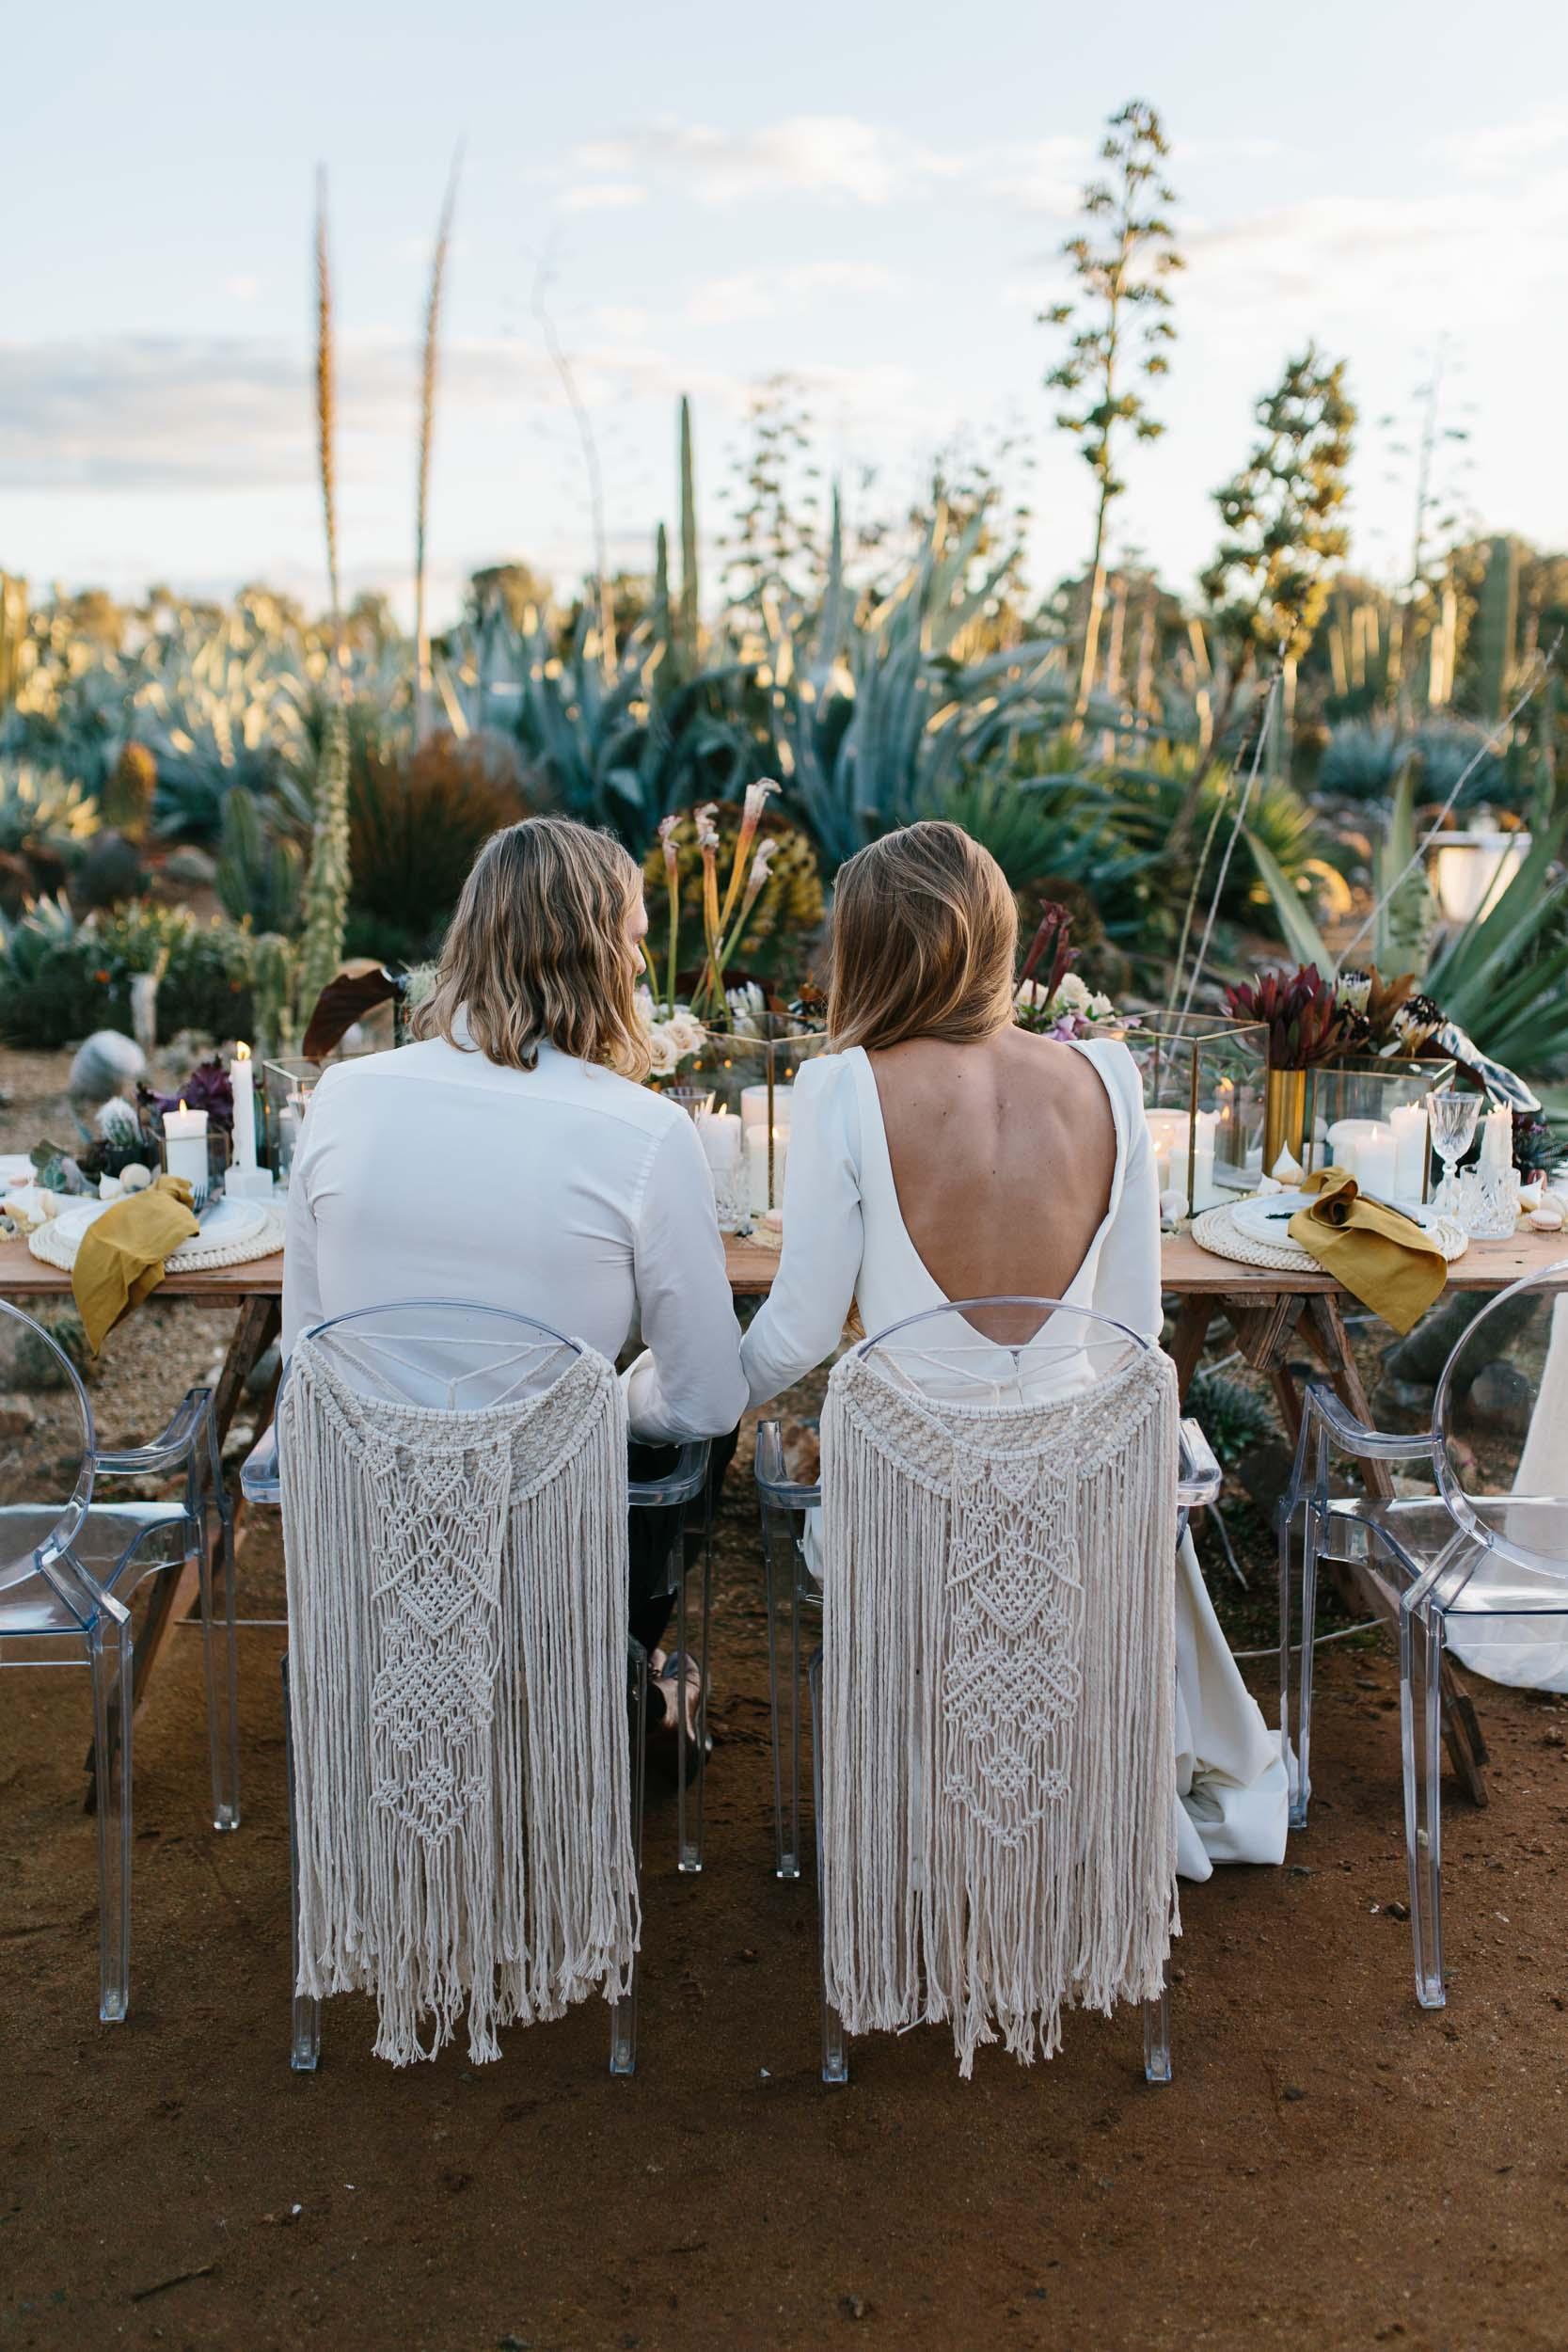 Kas-Richards-Ruby-and-James-Stylist-Cactus-Country-Karen-Willis-Holmes-Bridal-One-Heart-Studios-Boho-Wedding-126.jpg